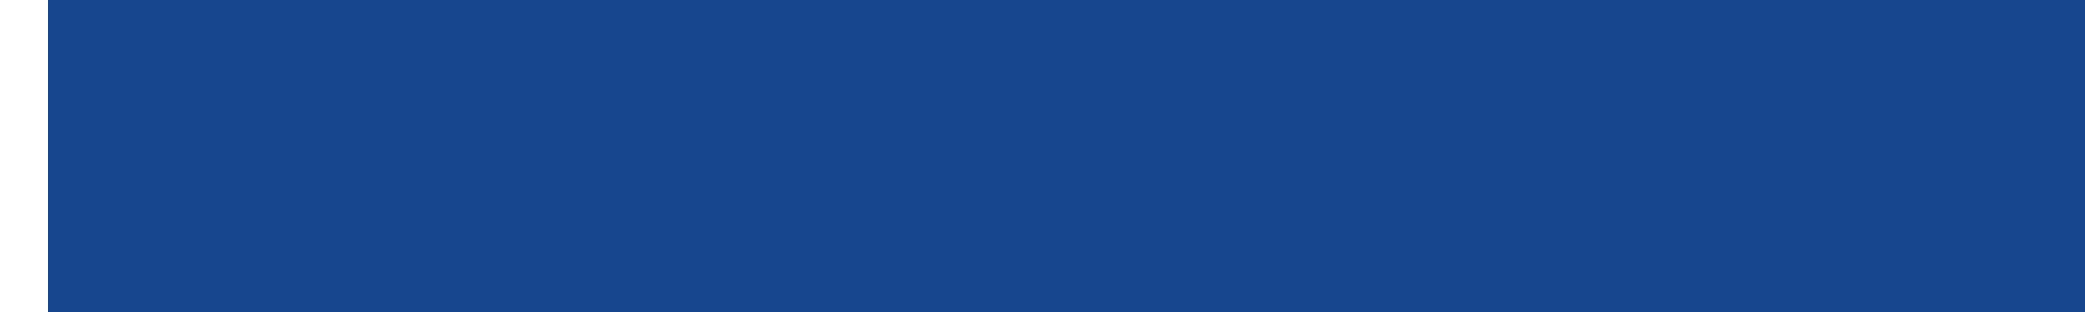 Samsung Logo Png - Free Transparent PNG Logos